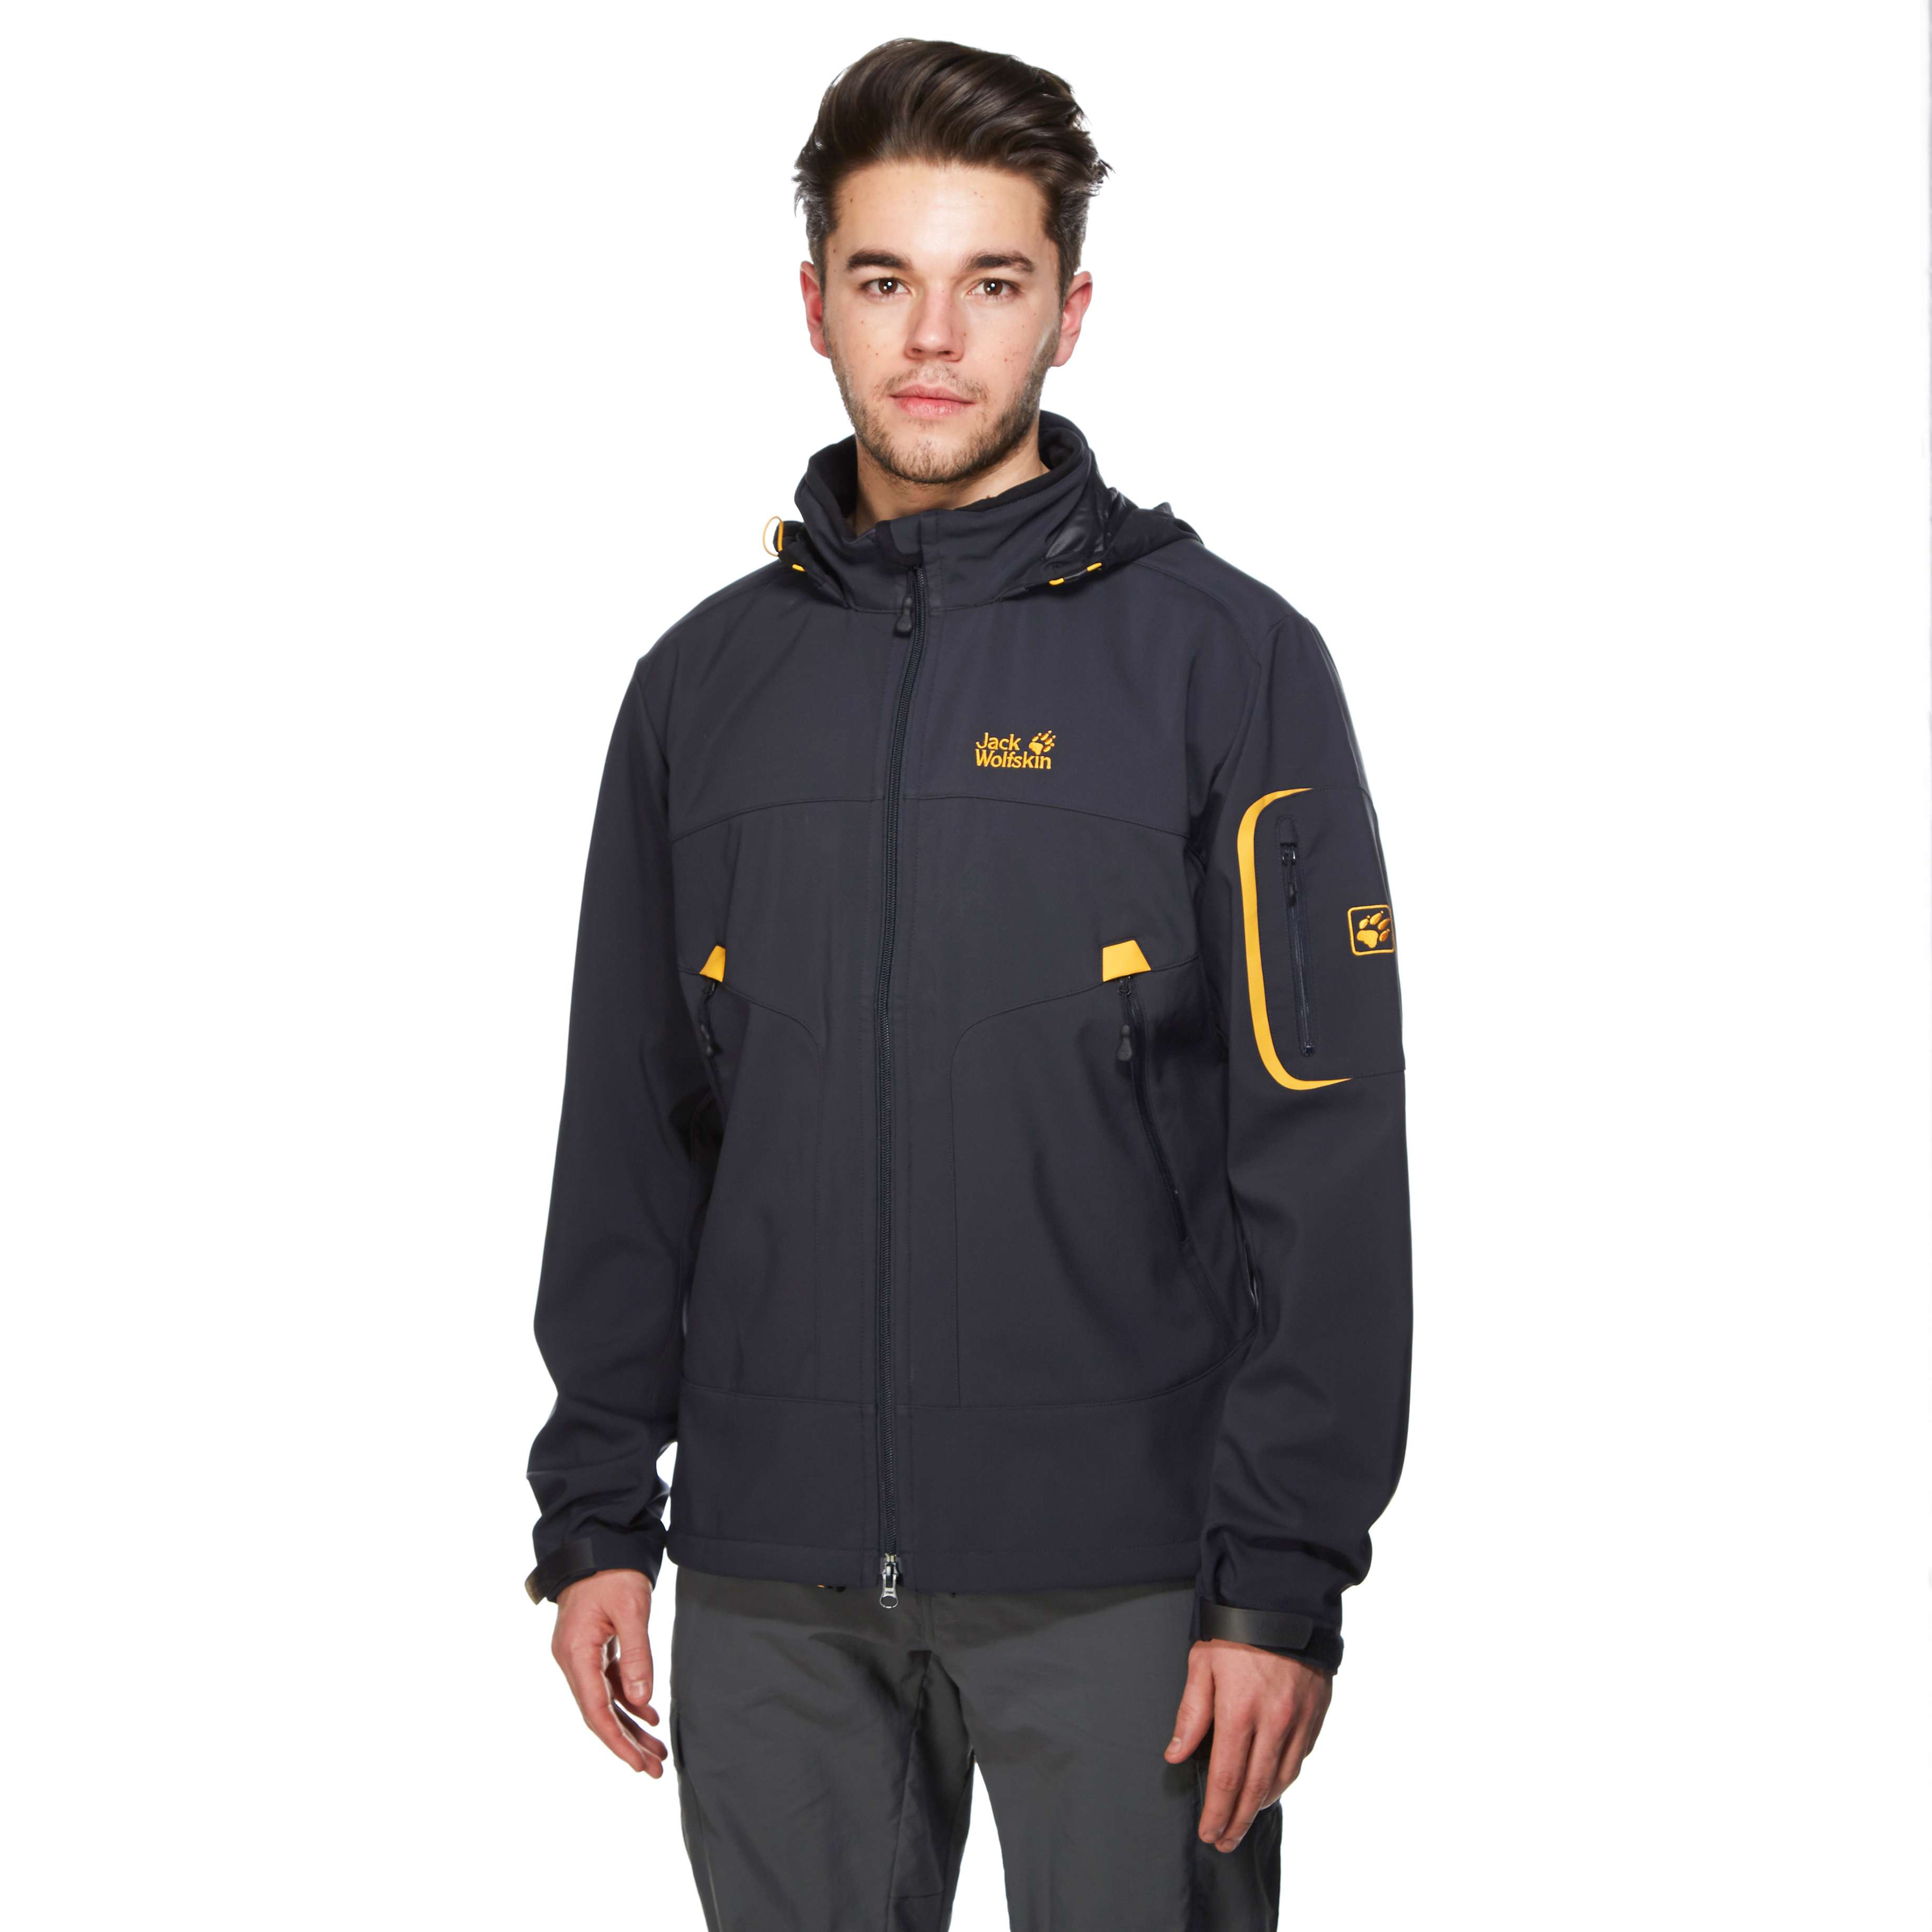 JACK WOLFSKIN Men's Chilly Pass Jacket